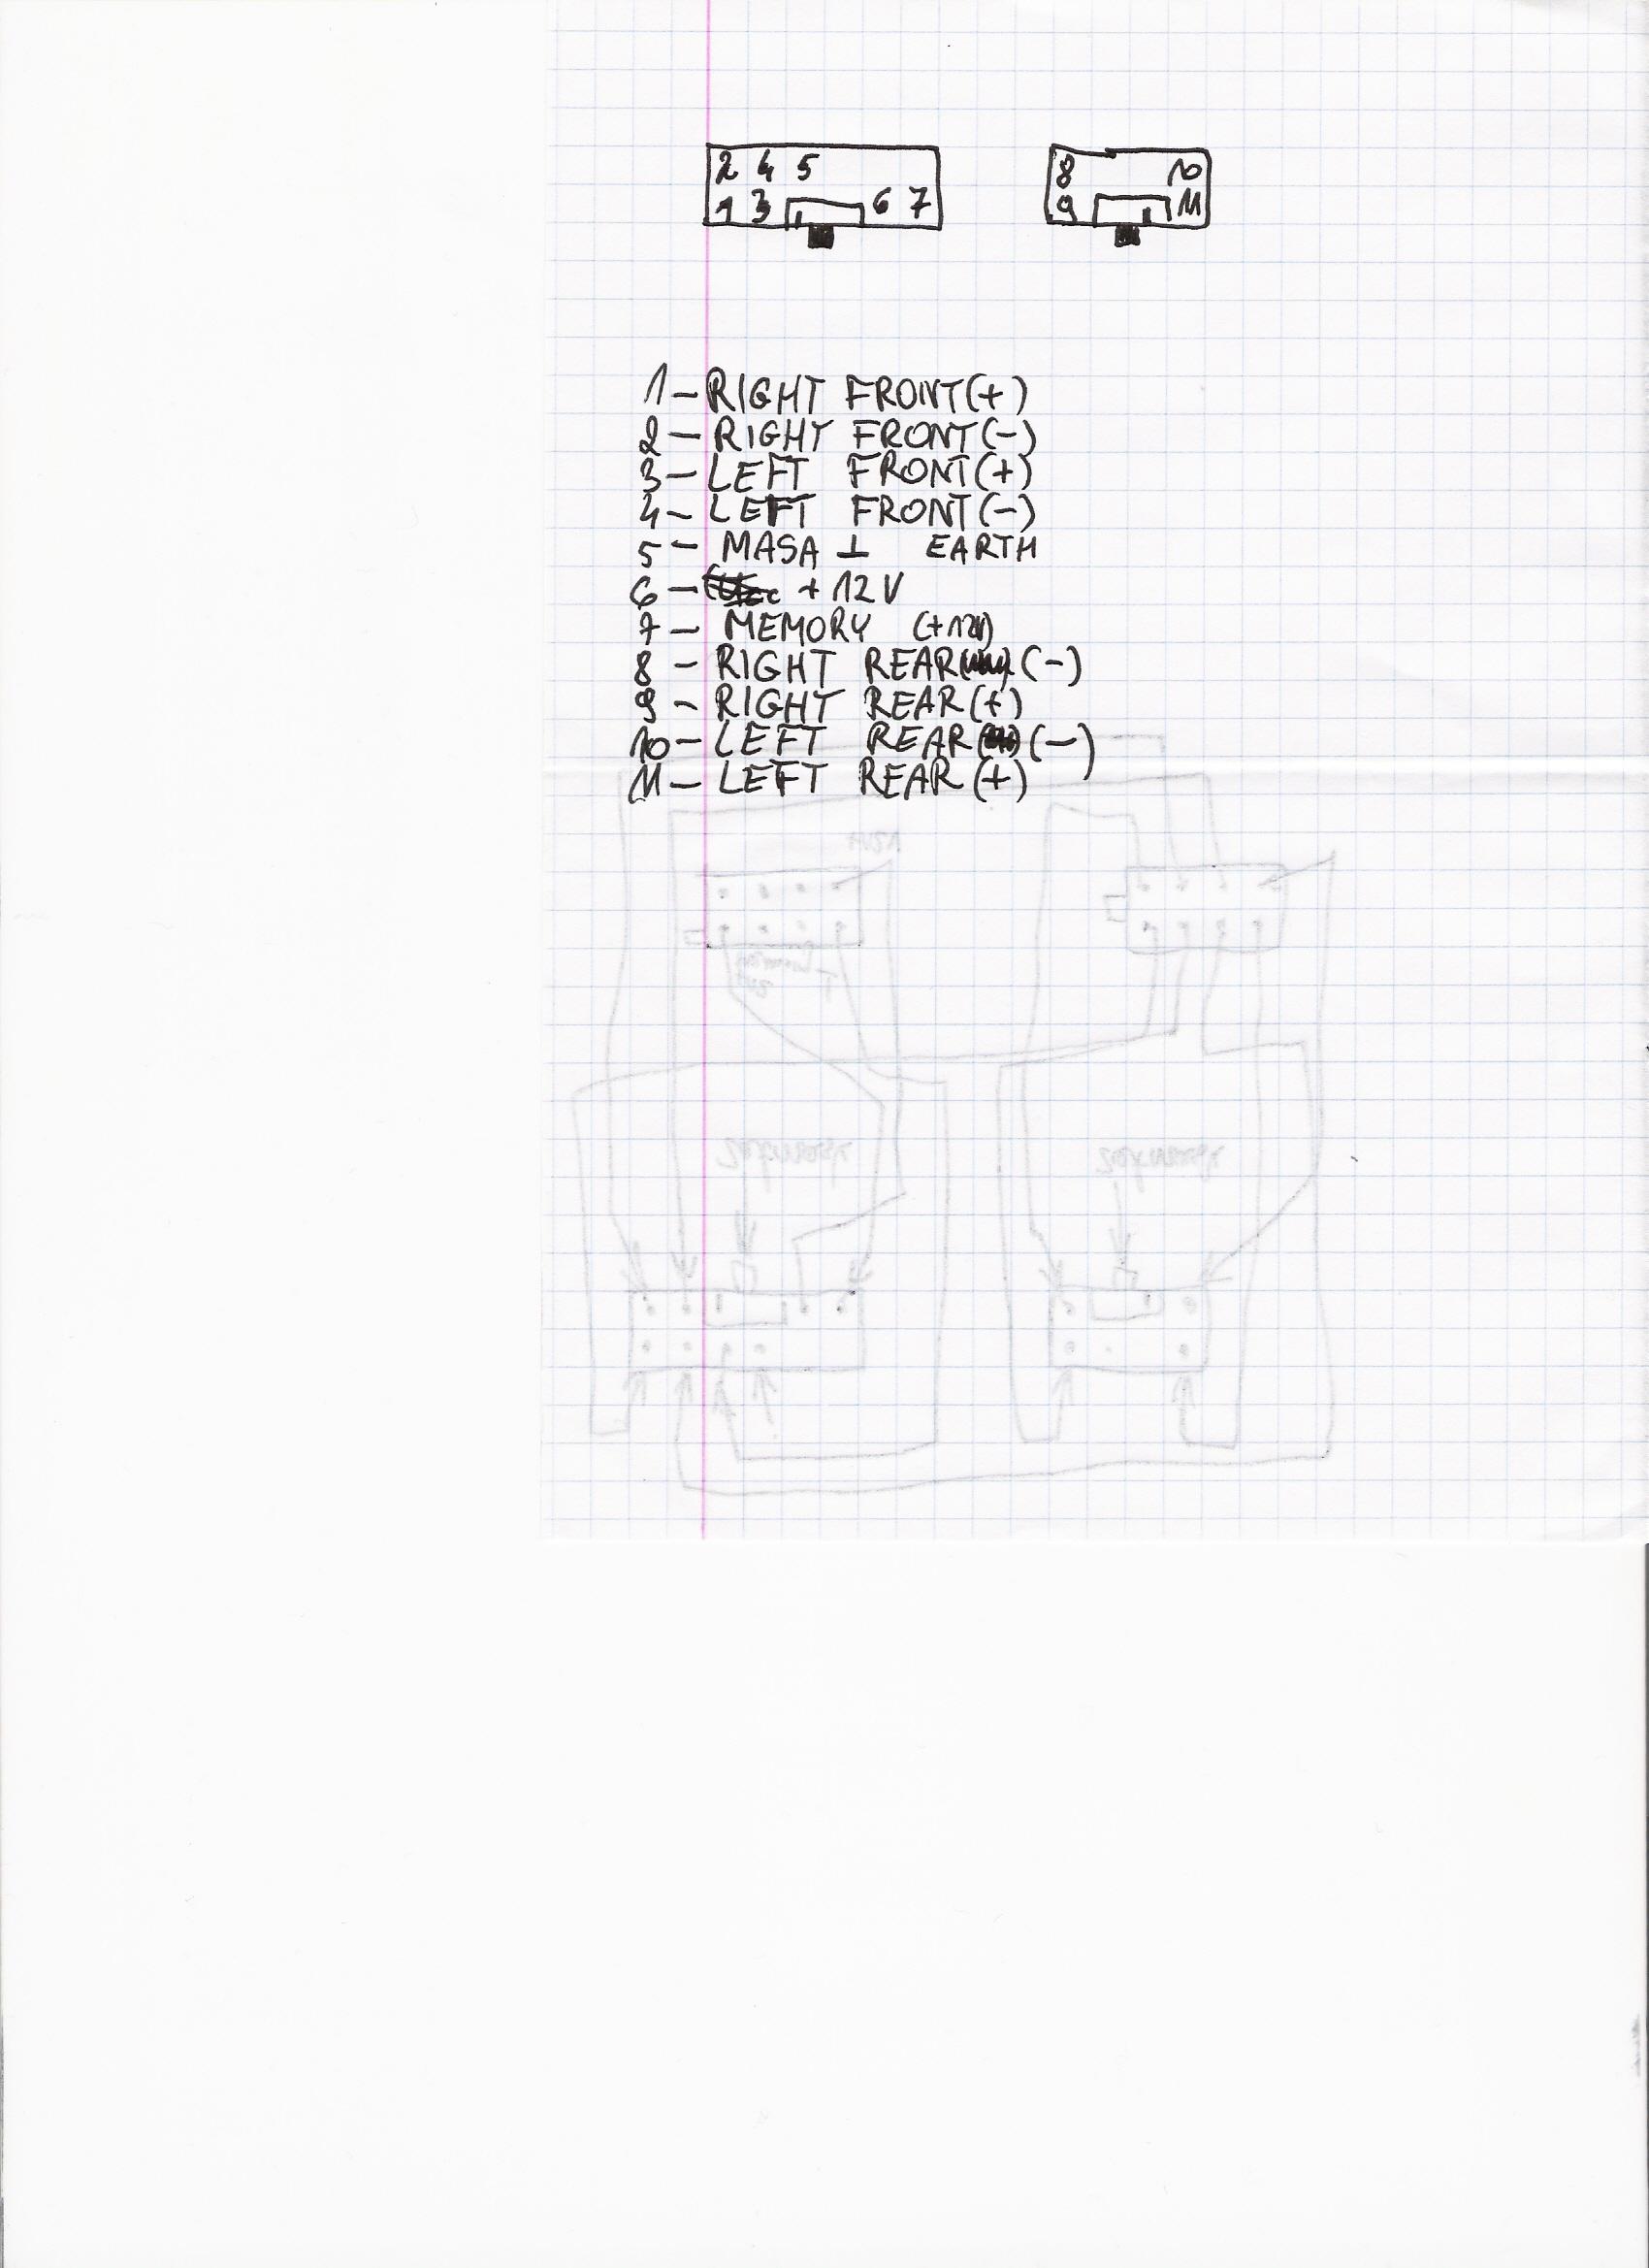 1997 Toyotum Corolla Radio Wiring Diagram Database